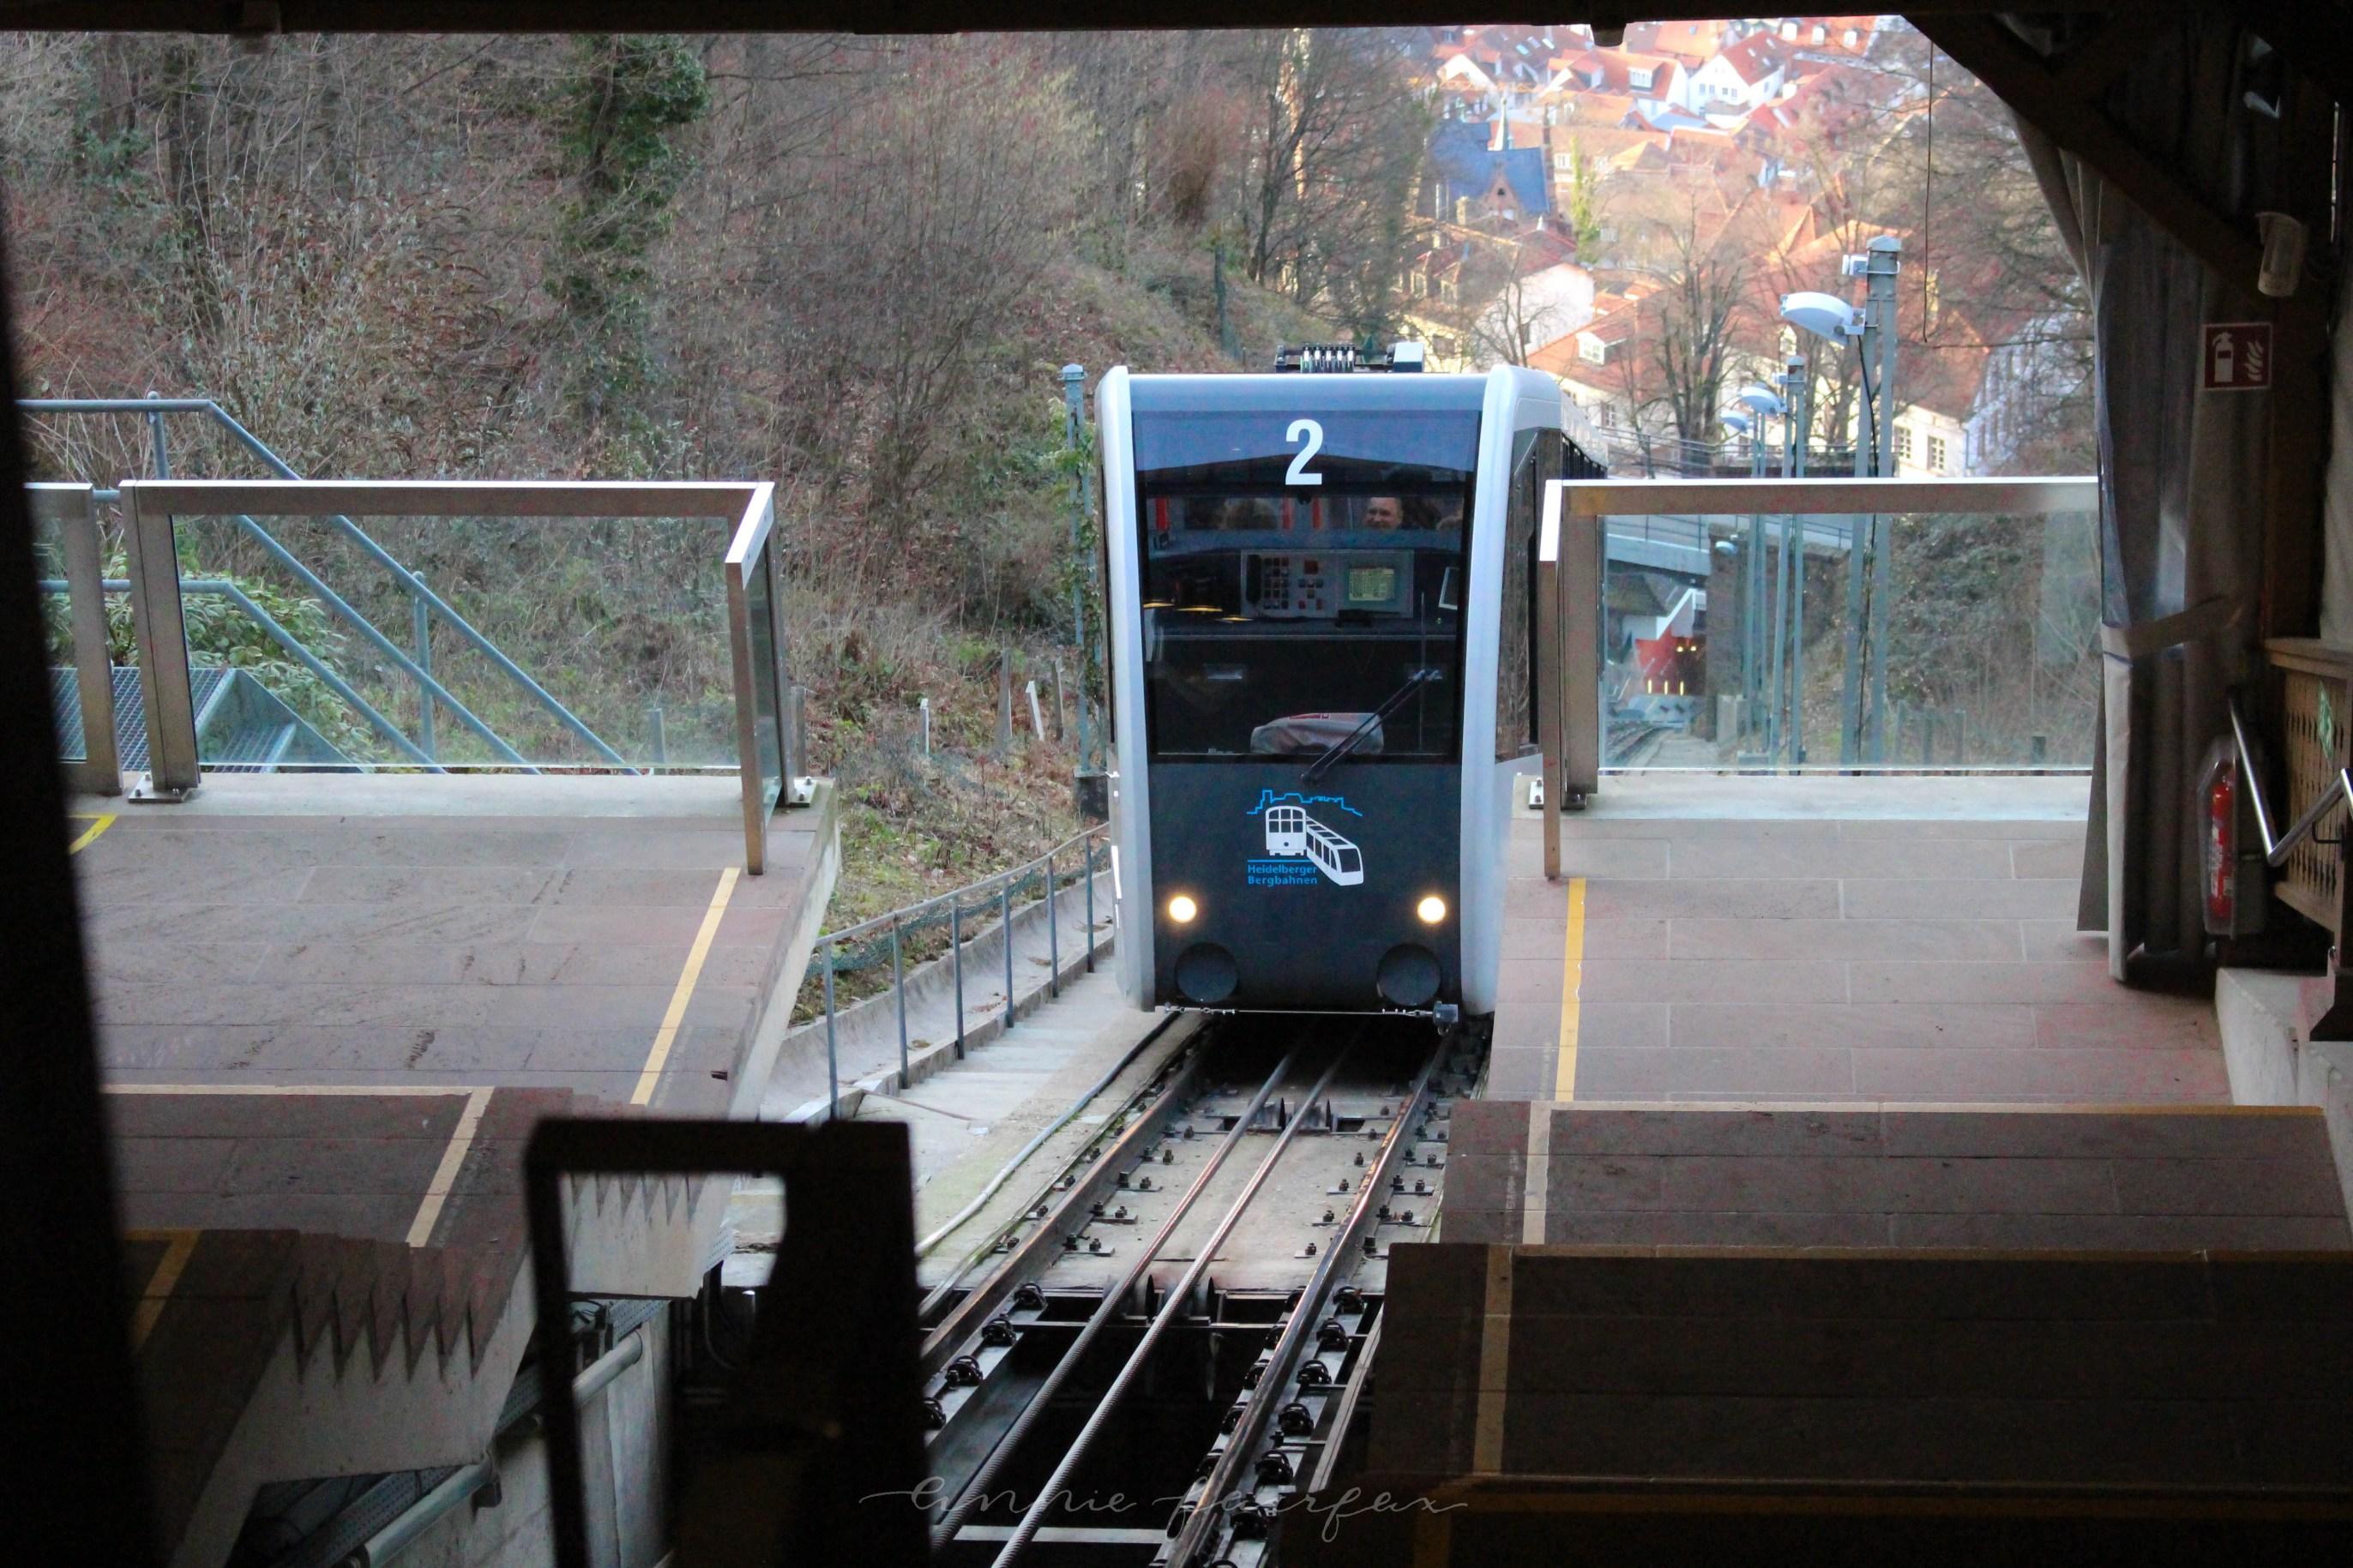 Konigstuhl in Heidelberg, Germany Tram